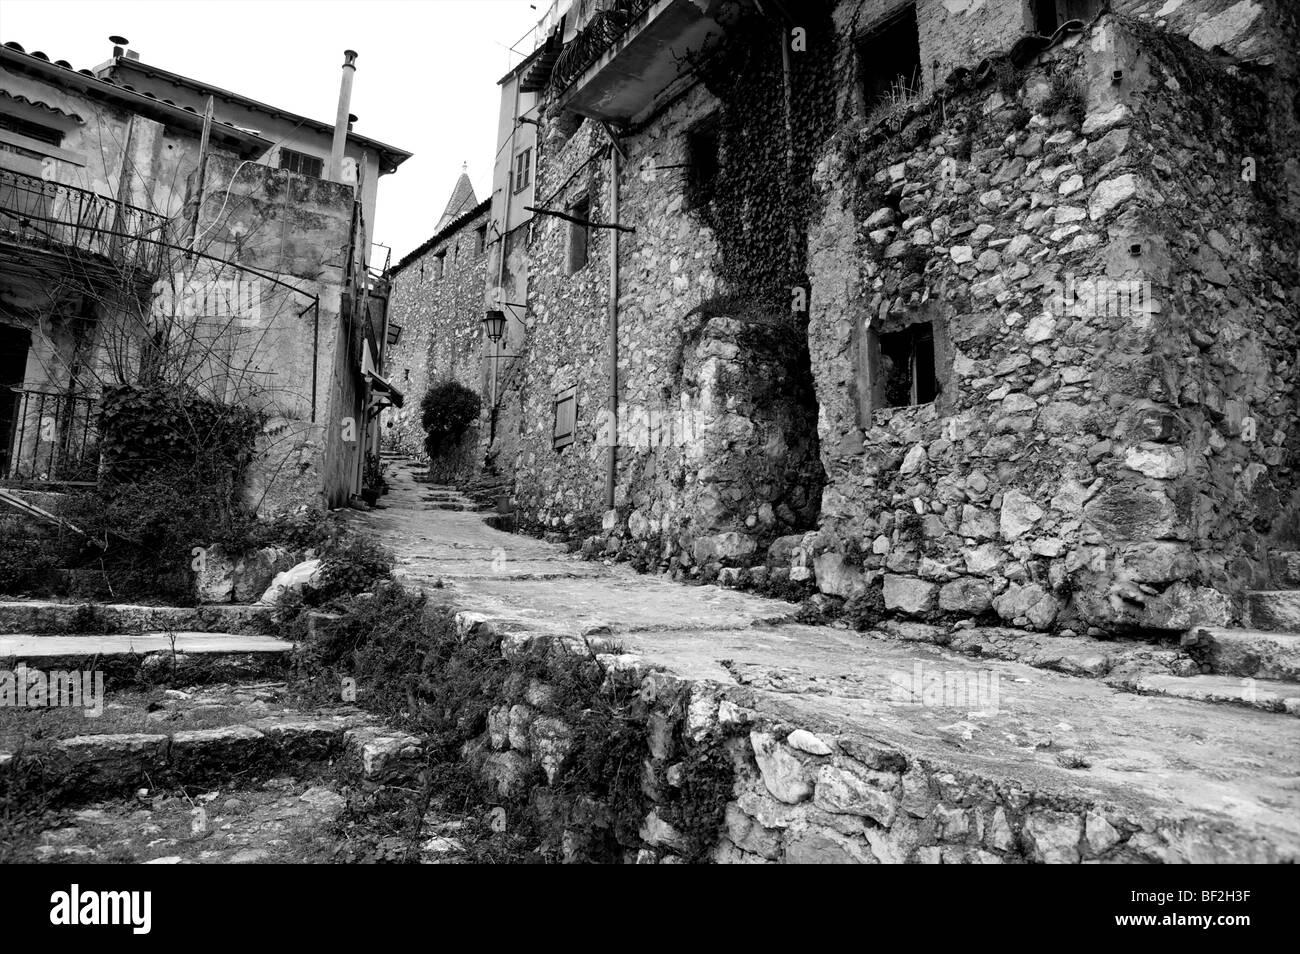 Gorbio, Alpes-Maritimes path way between old buildings Stock Photo